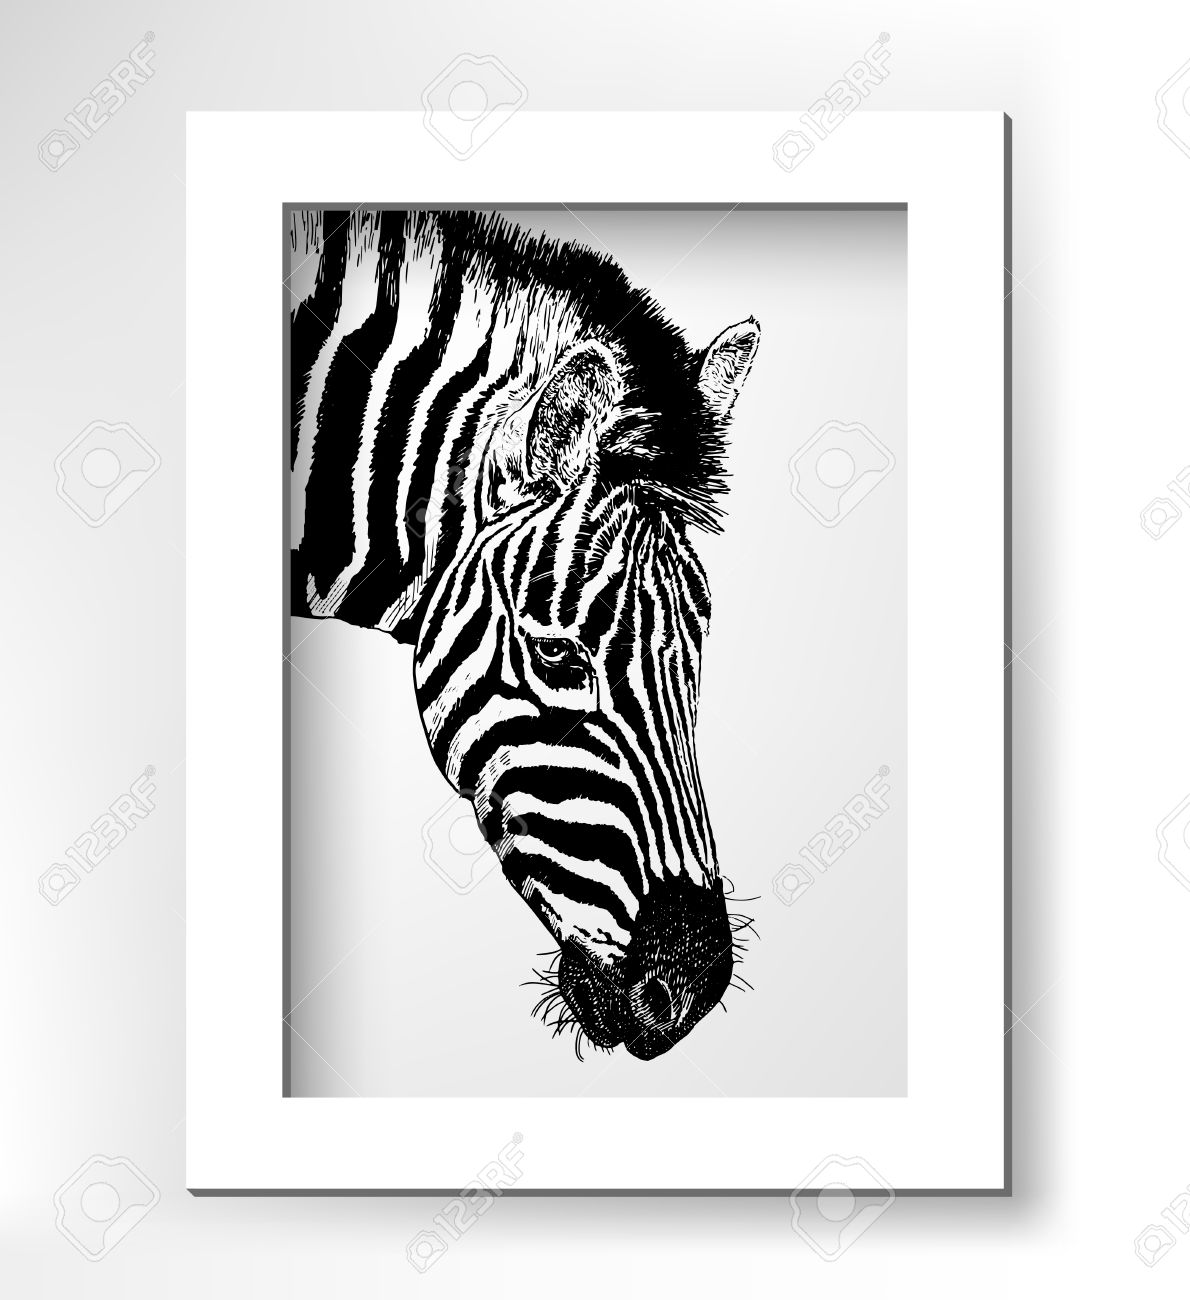 Kunstwerk Kopfprofil Zebra, Digitale Skizze Tier, Realistisch ...